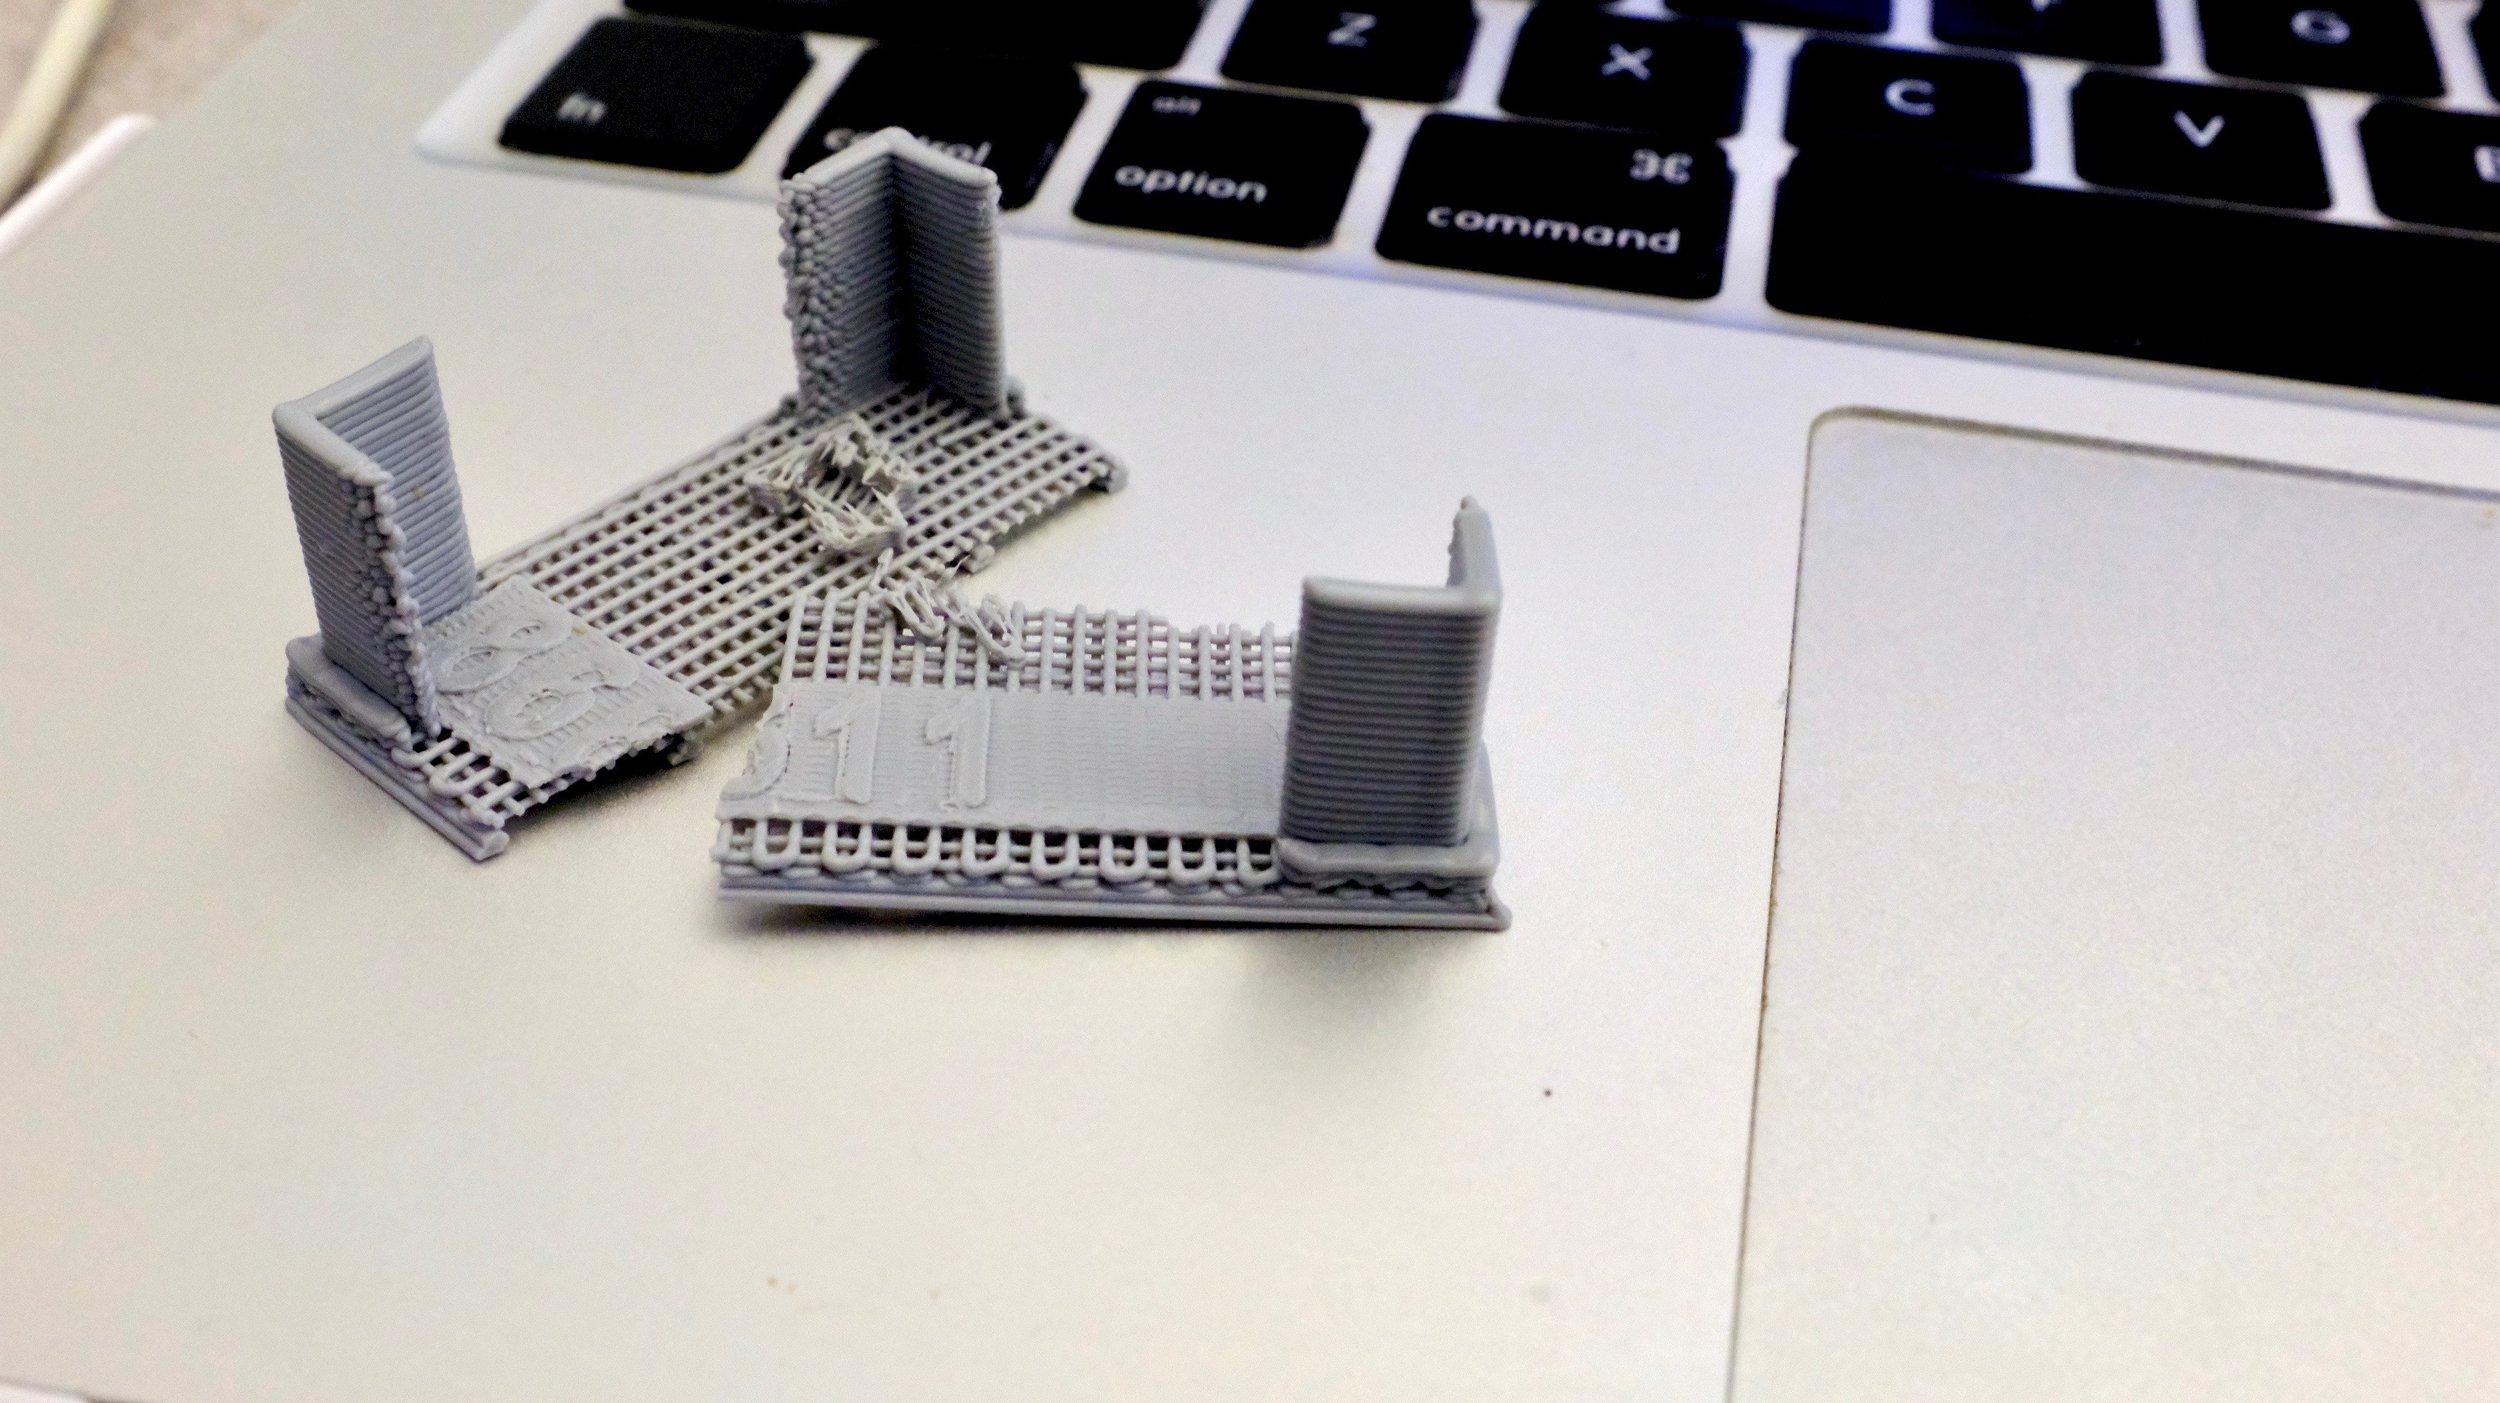 Broken off support structure